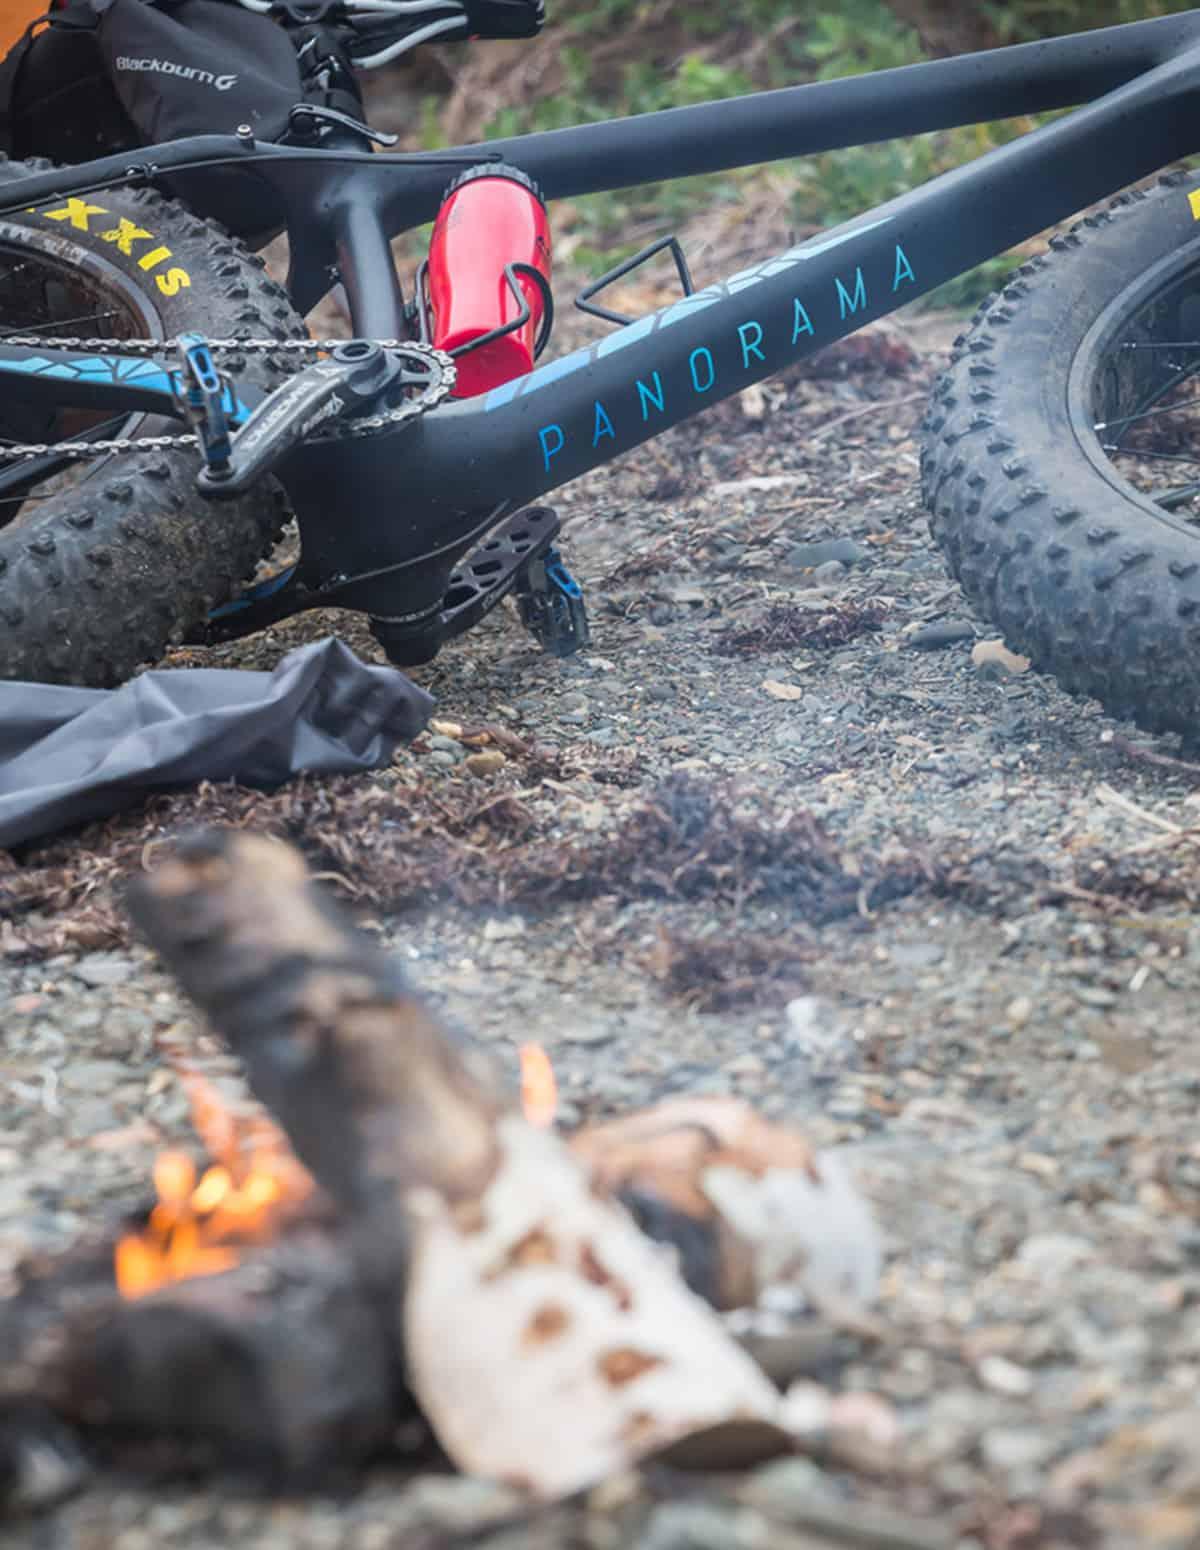 Un vélo fatbike Panorama Chic-Chocs et un feu de camp